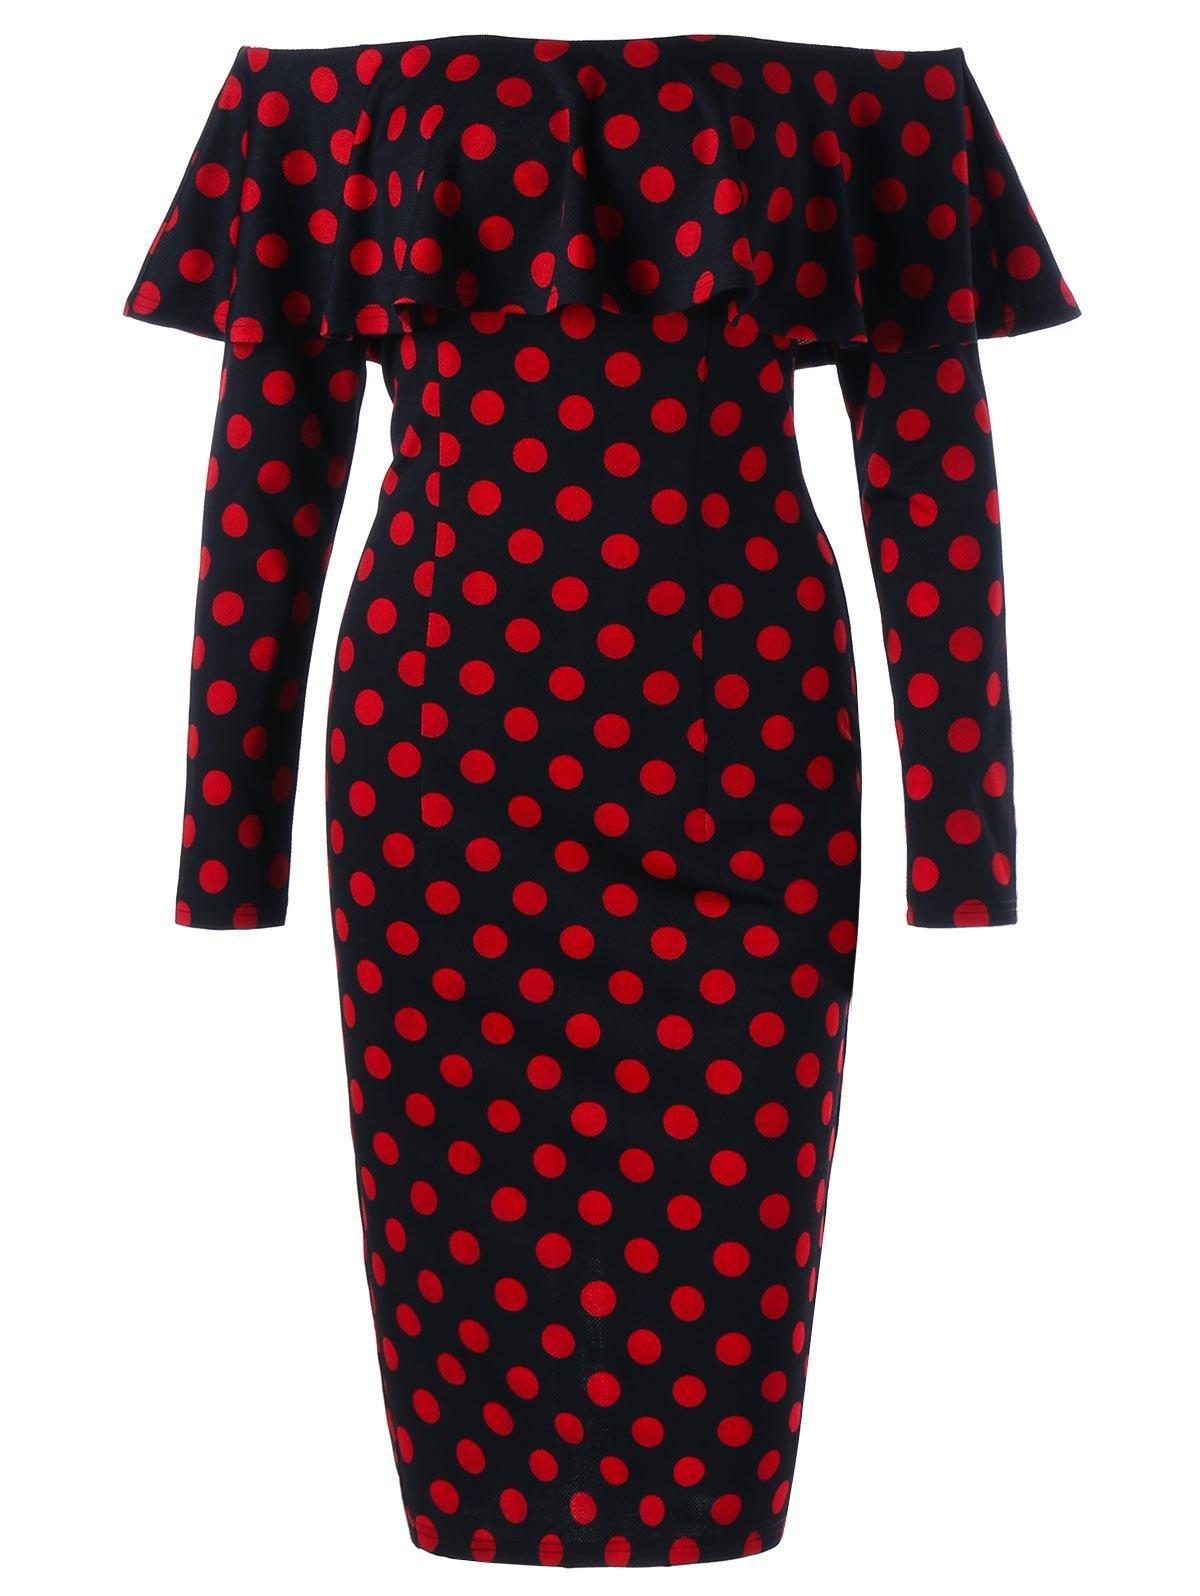 Sammydress rosewholesale womenus stylish pure color long sleeve